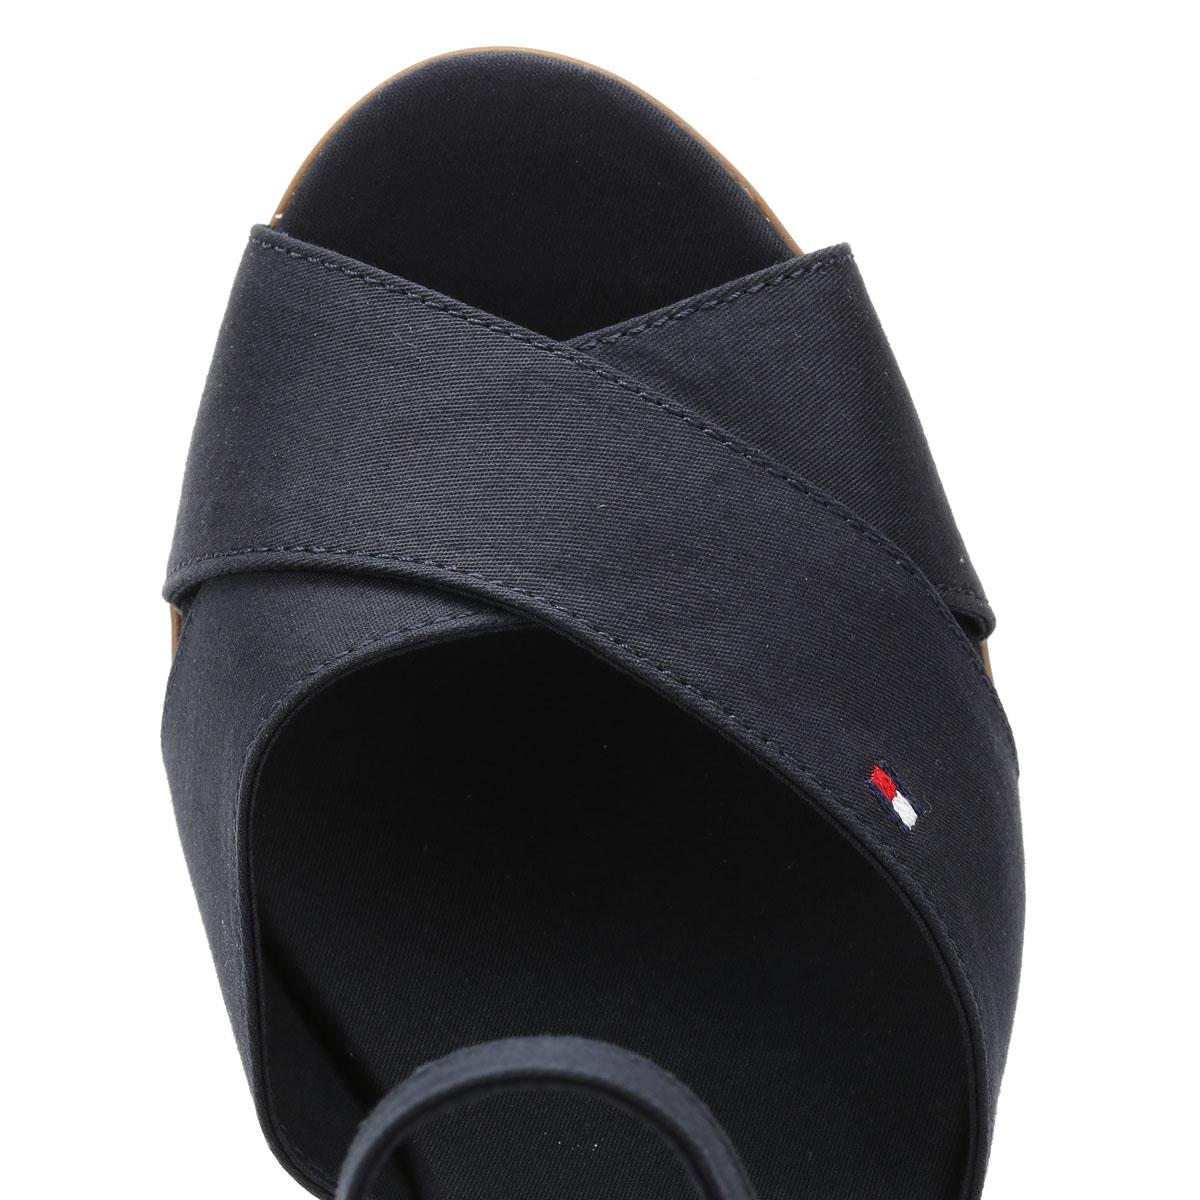 ff5f8a6da Tommy Hilfiger Womens Wedge Sandals